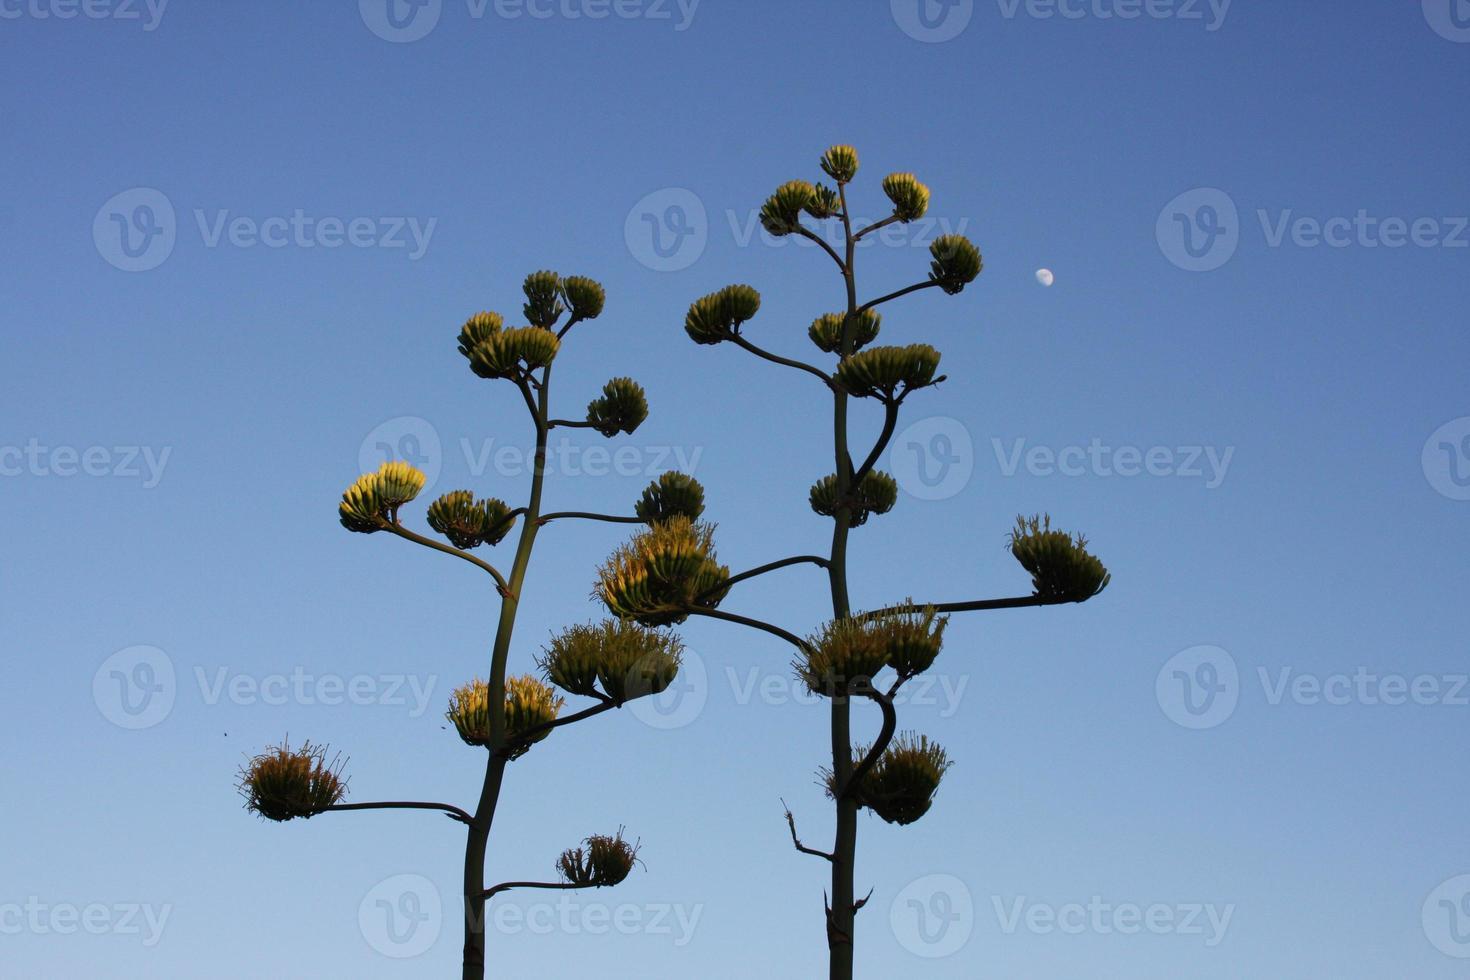 woestijnplanten foto